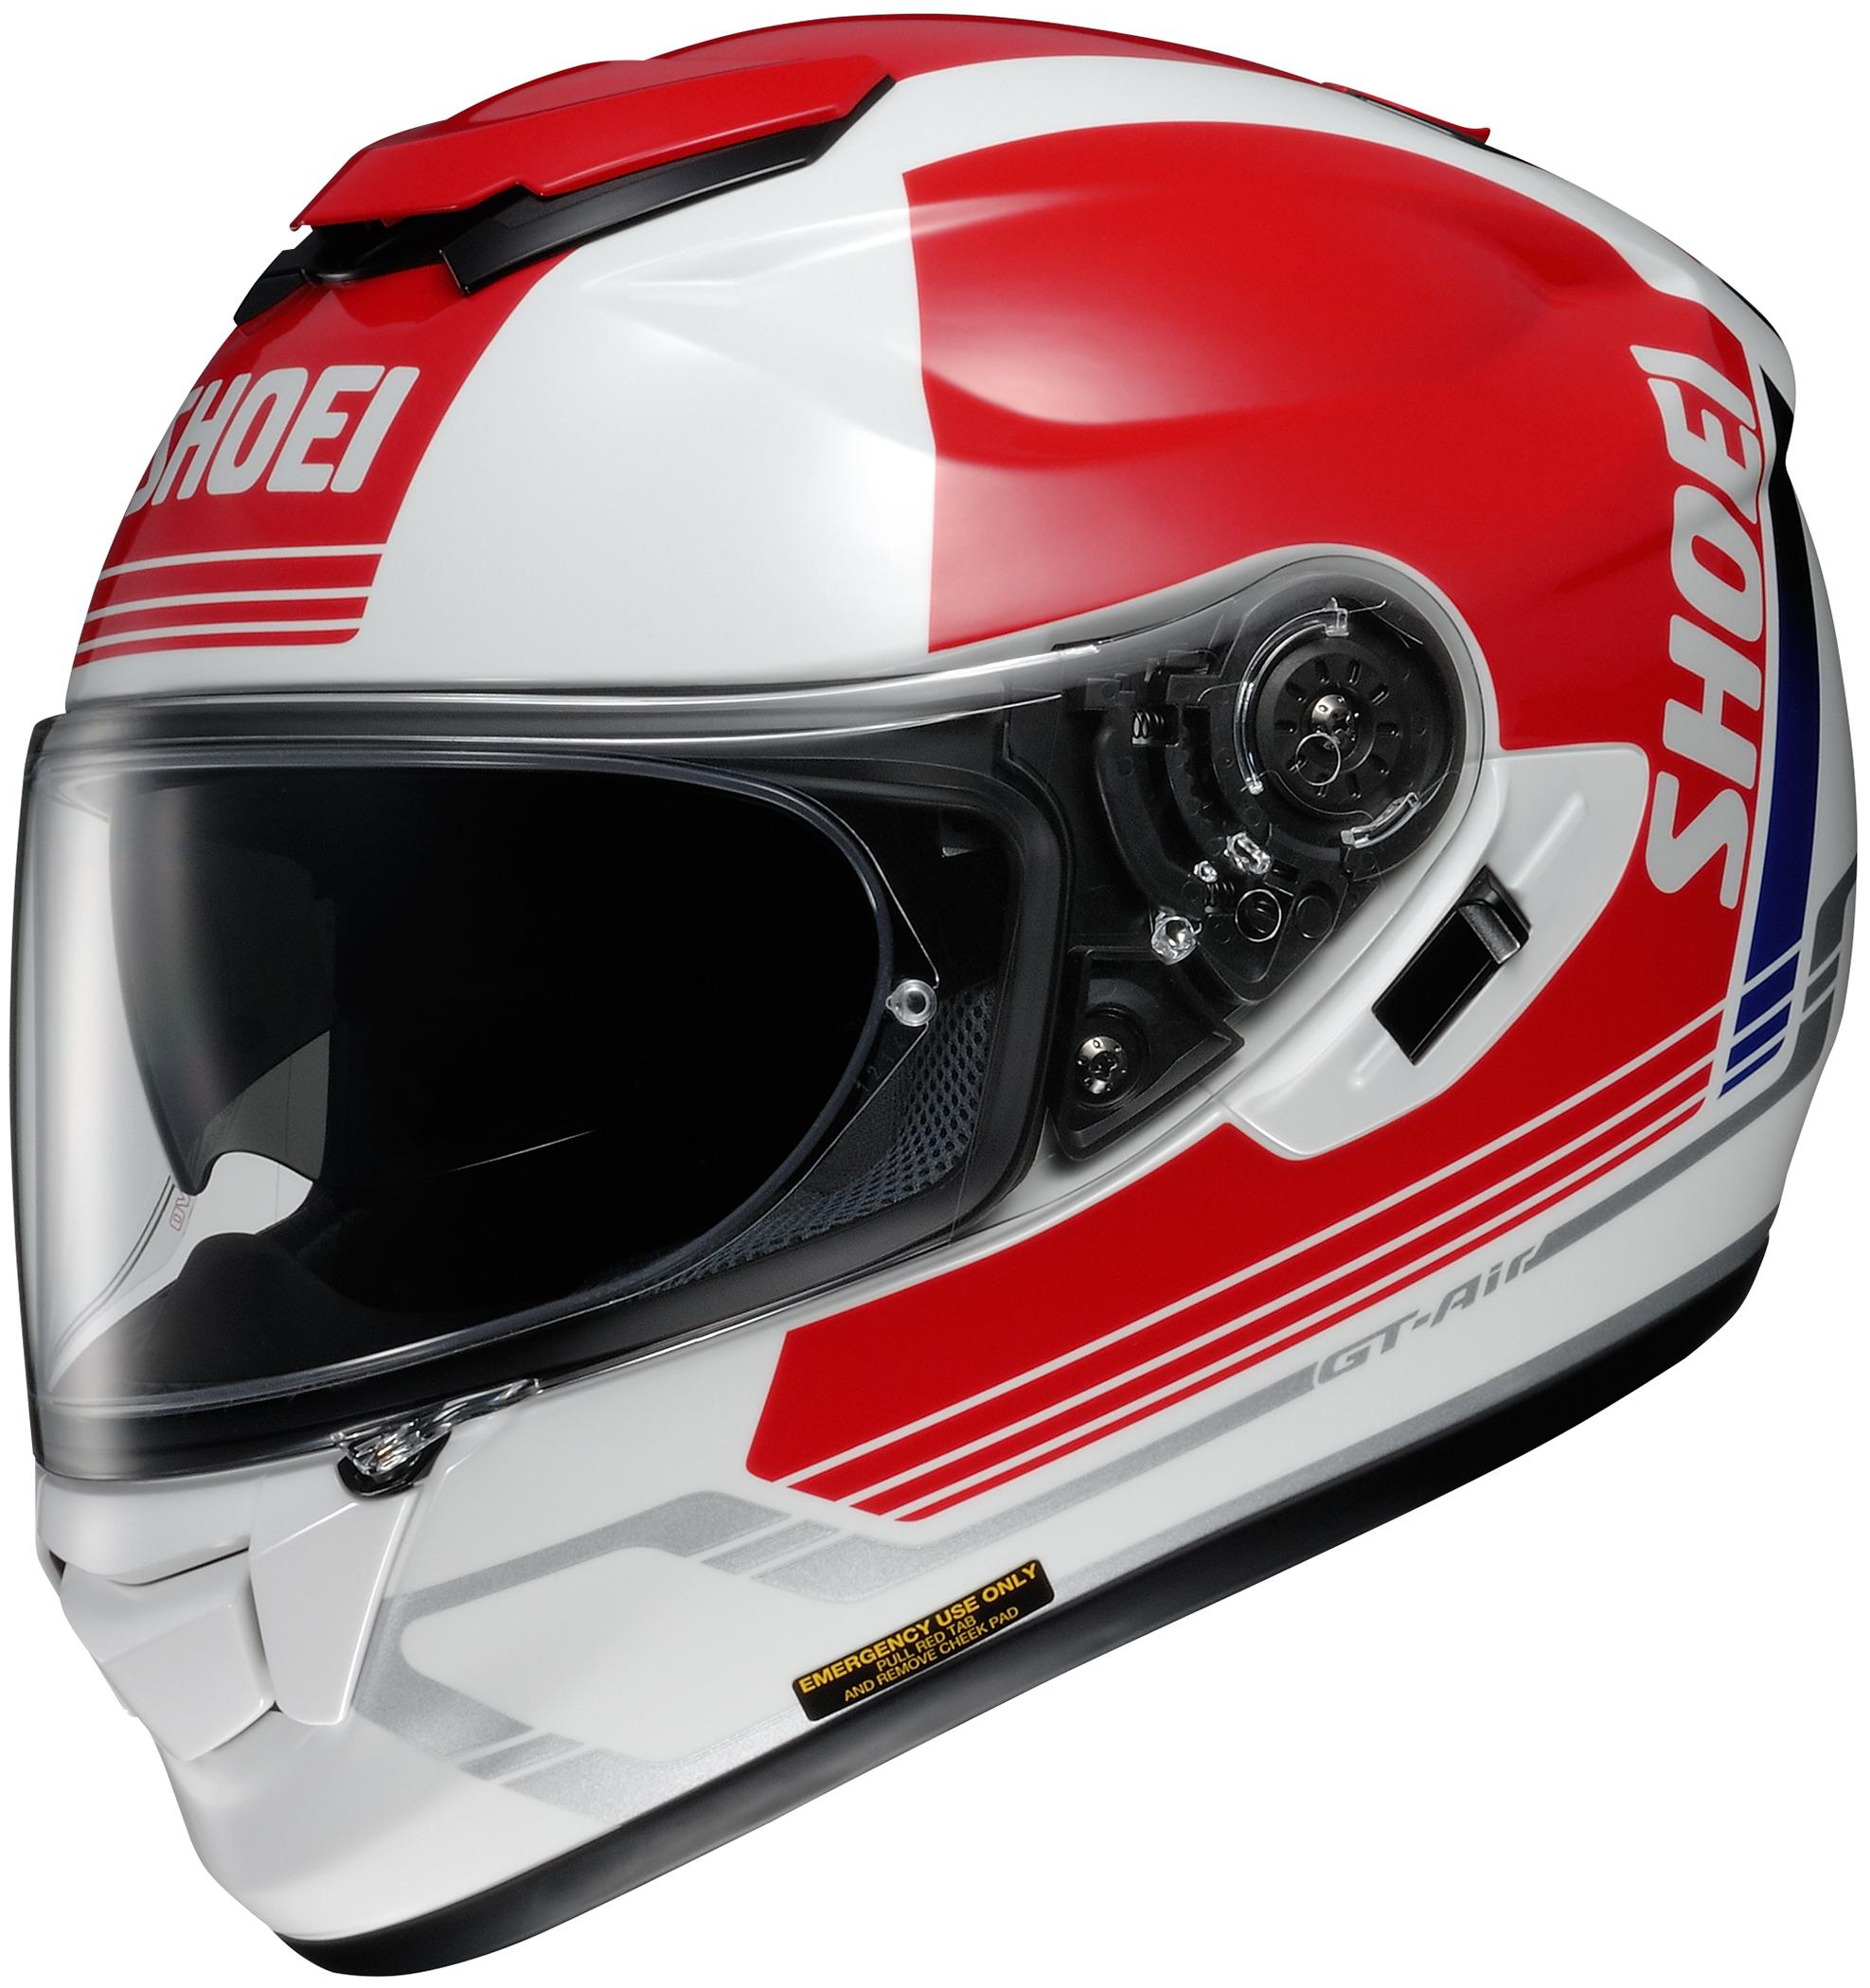 2018 shoei gt air decade helmet full face street. Black Bedroom Furniture Sets. Home Design Ideas